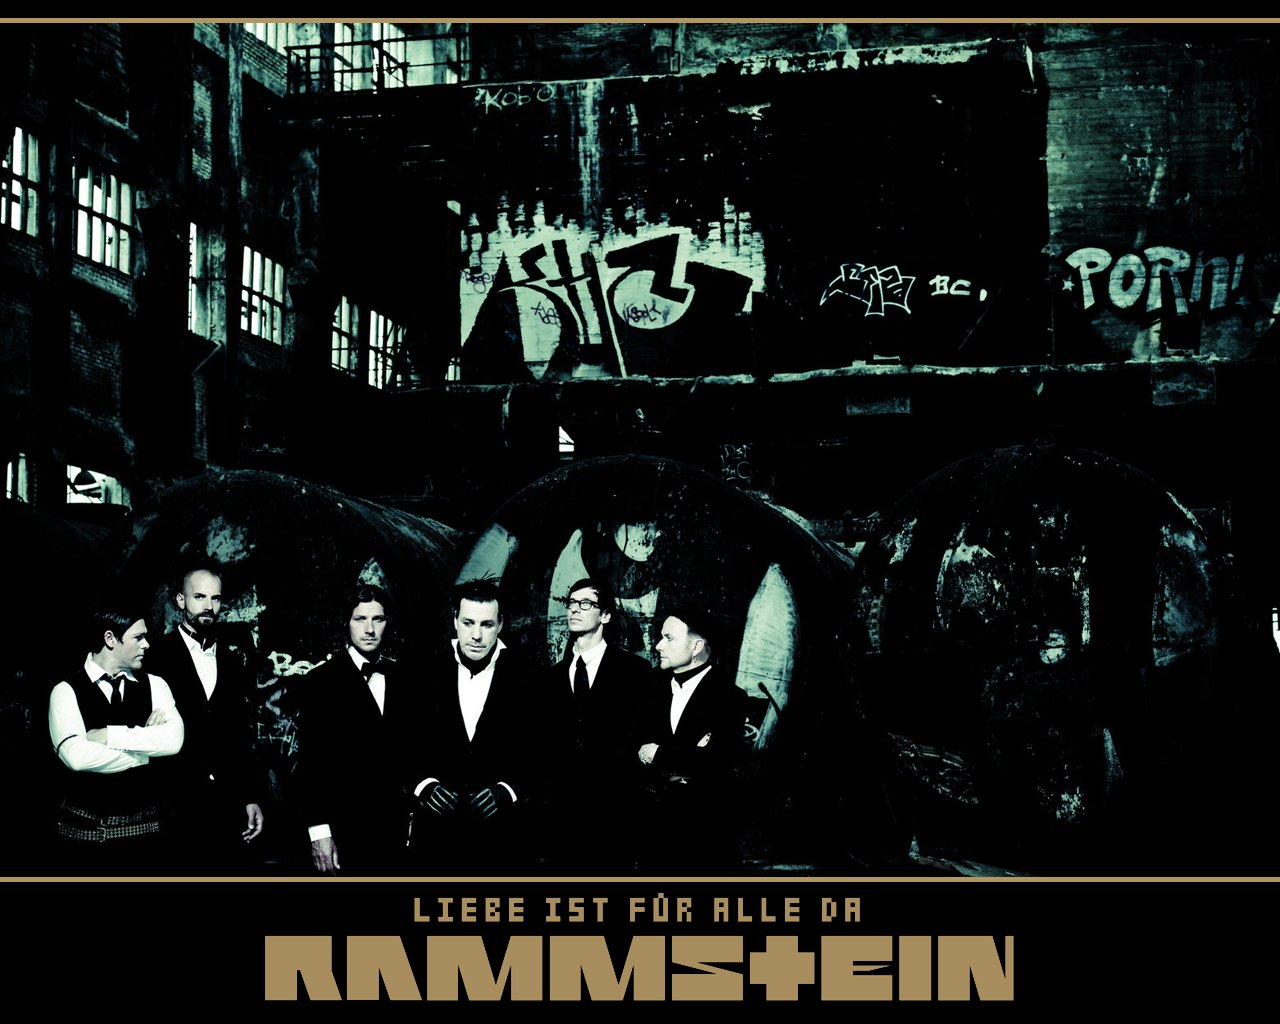 Rammstein - обои на рабочий стол 1280x1024